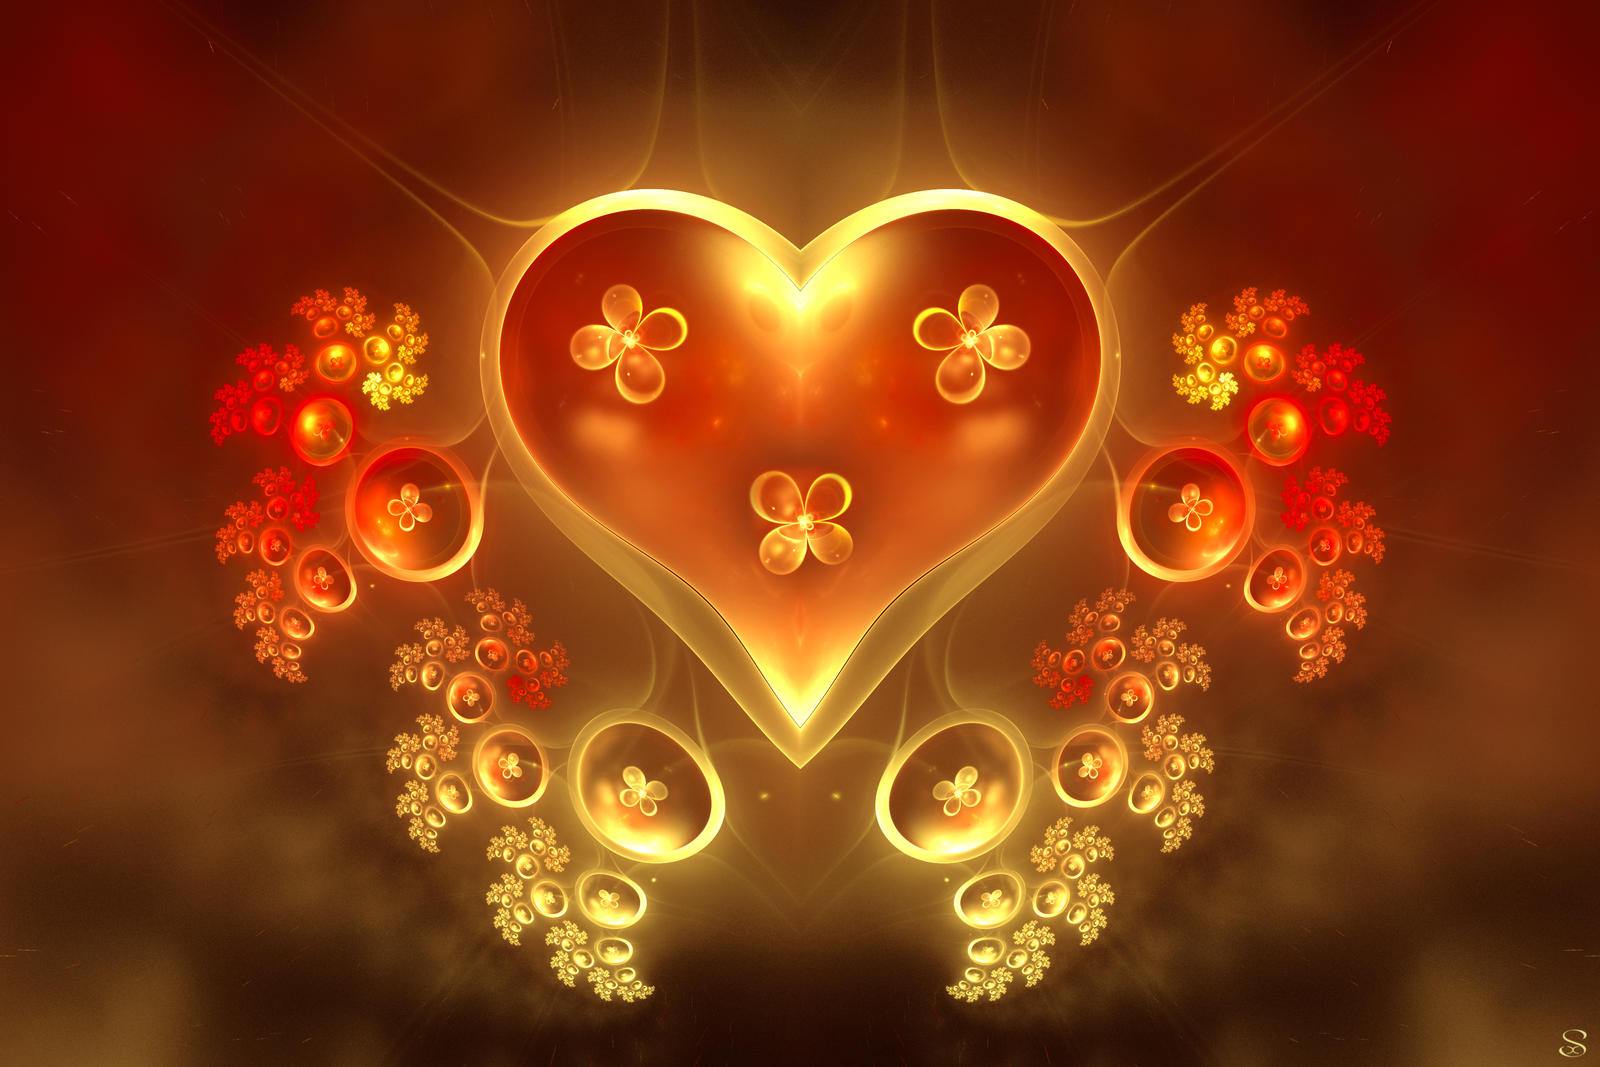 http://fc07.deviantart.net/fs71/i/2013/179/f/0/treasure_heart_by_stufferhelix-d6b2e0c.jpg